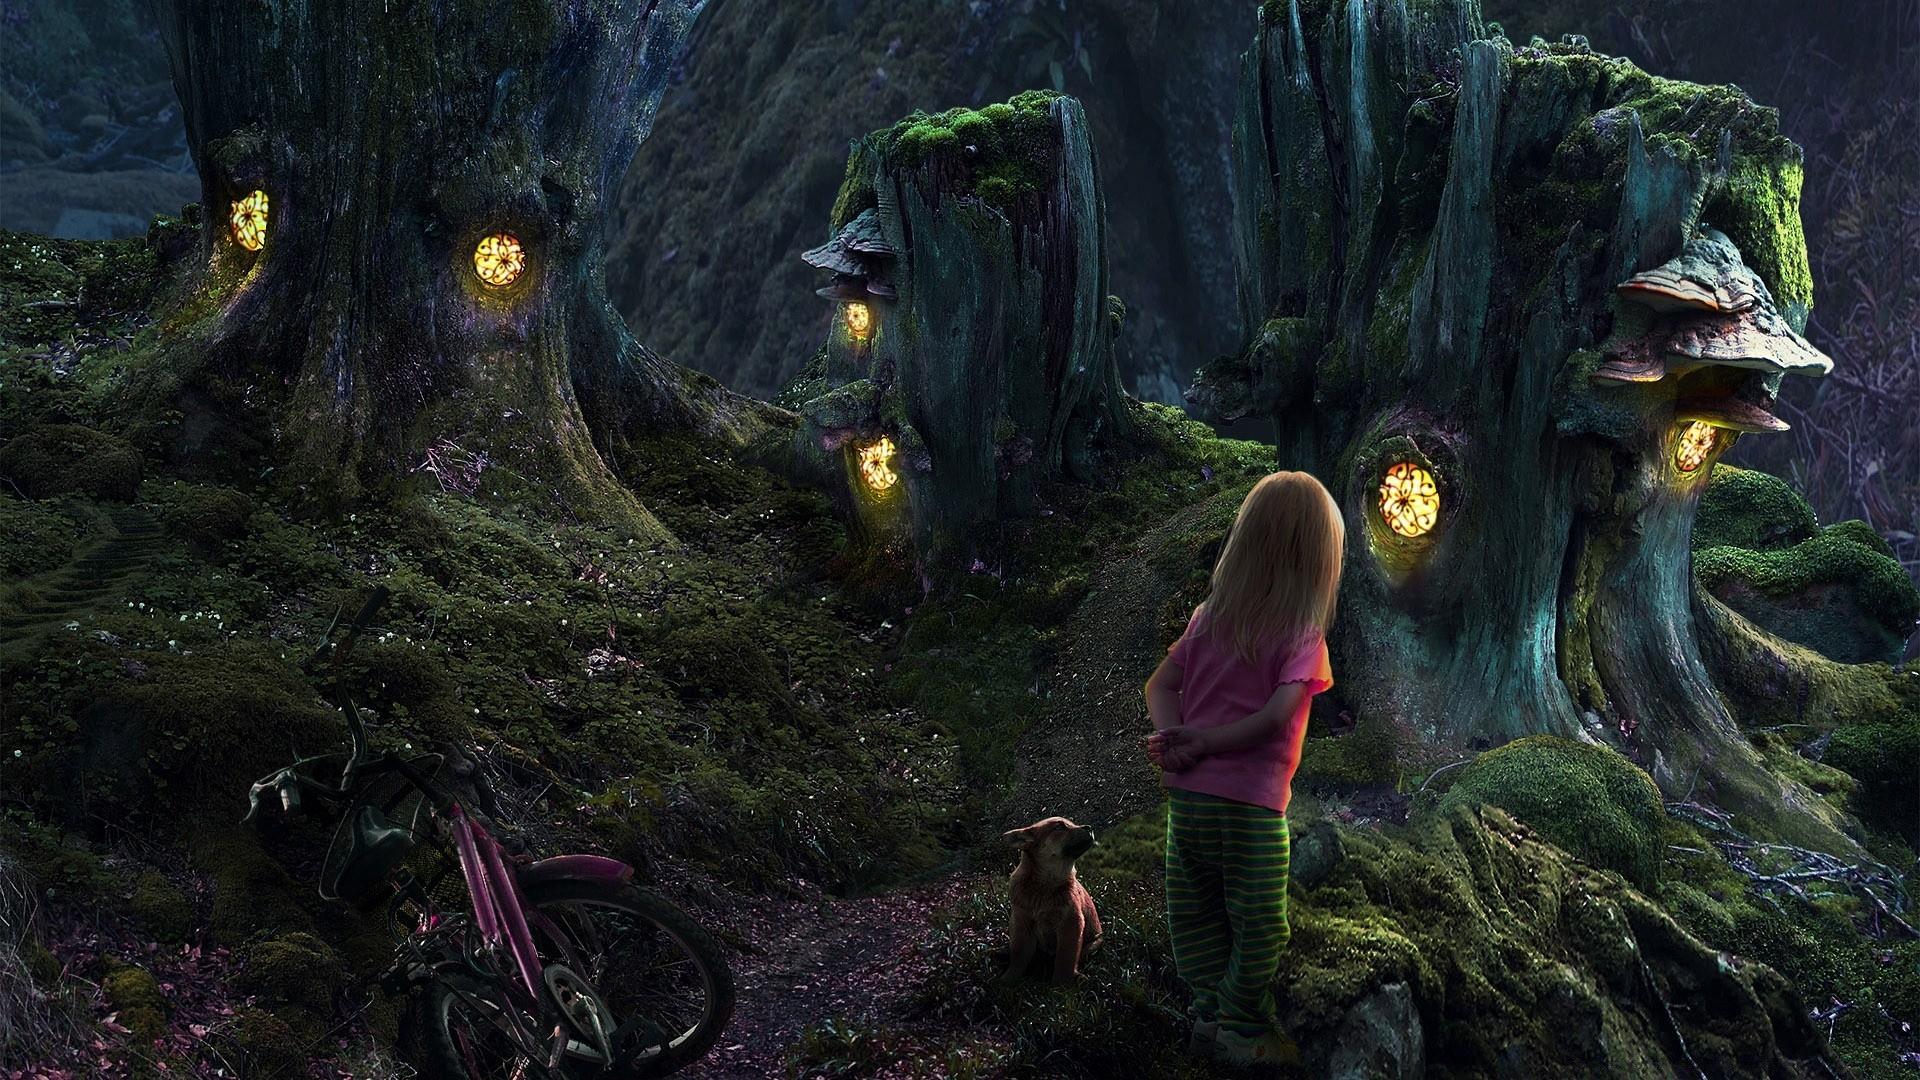 Fairy Tree Houses Phone Wallpapers